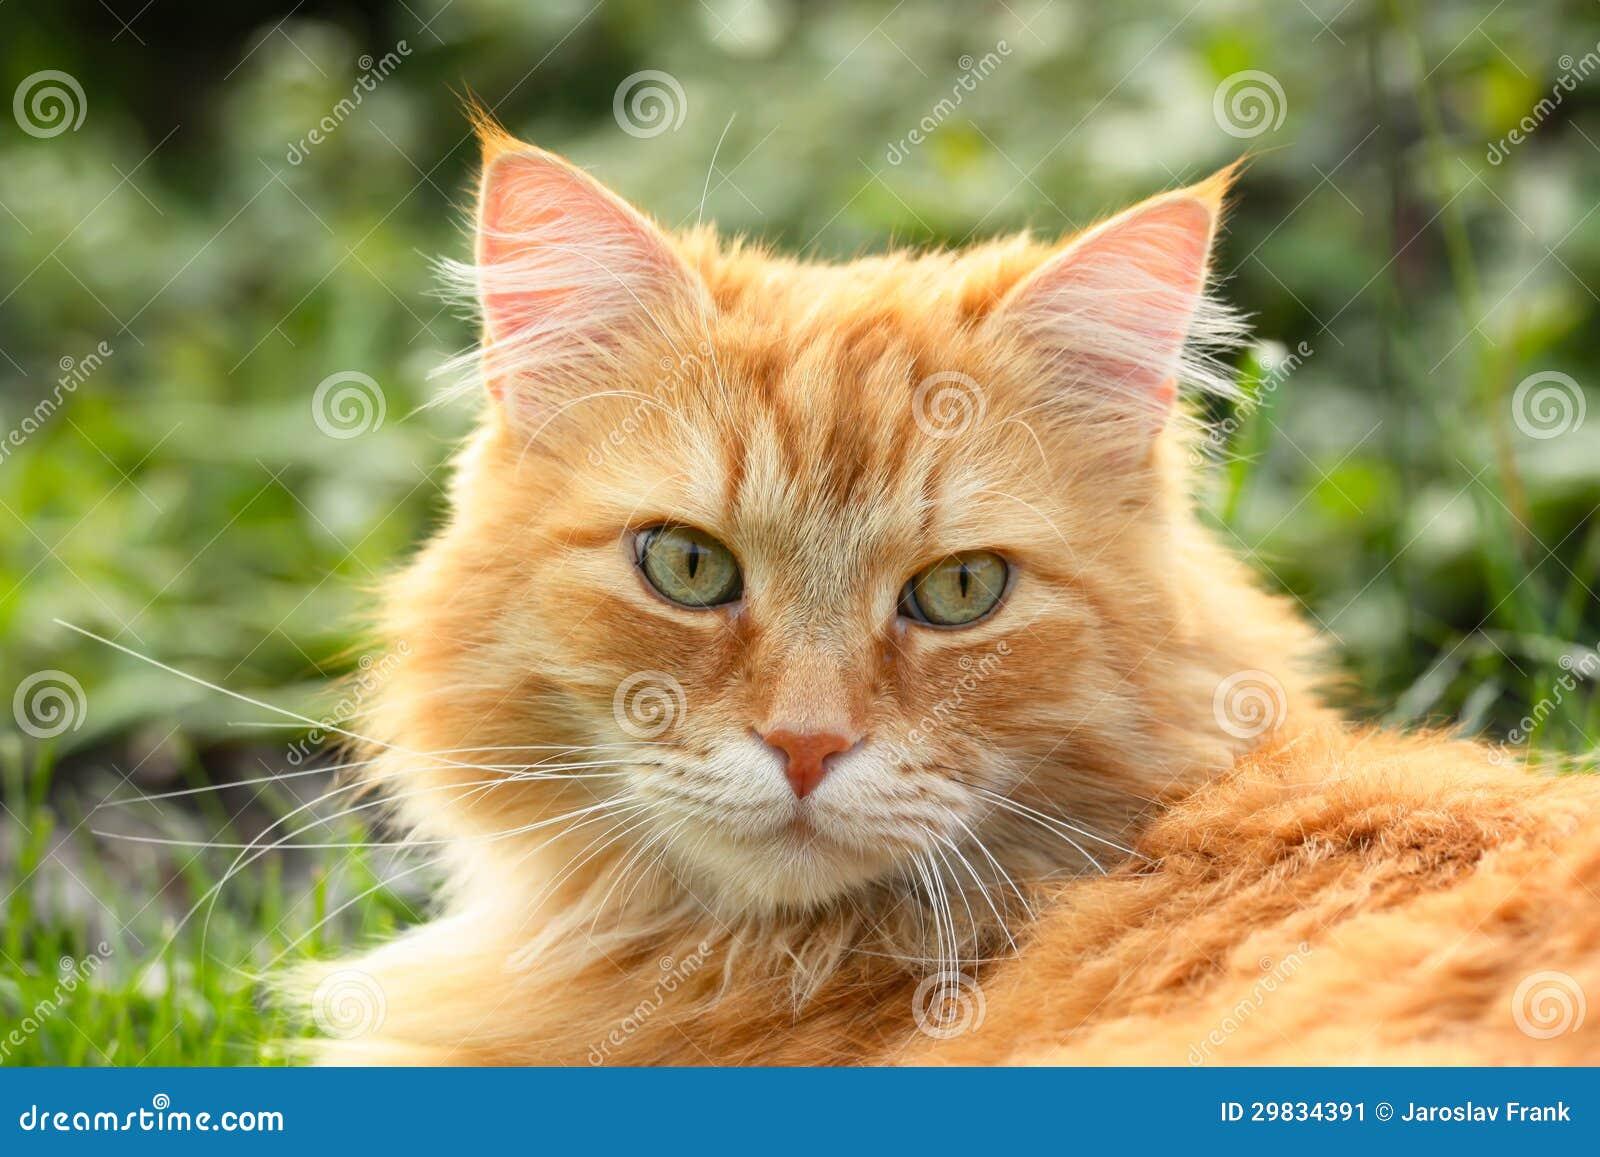 Retrato de um gato bonito do gengibre